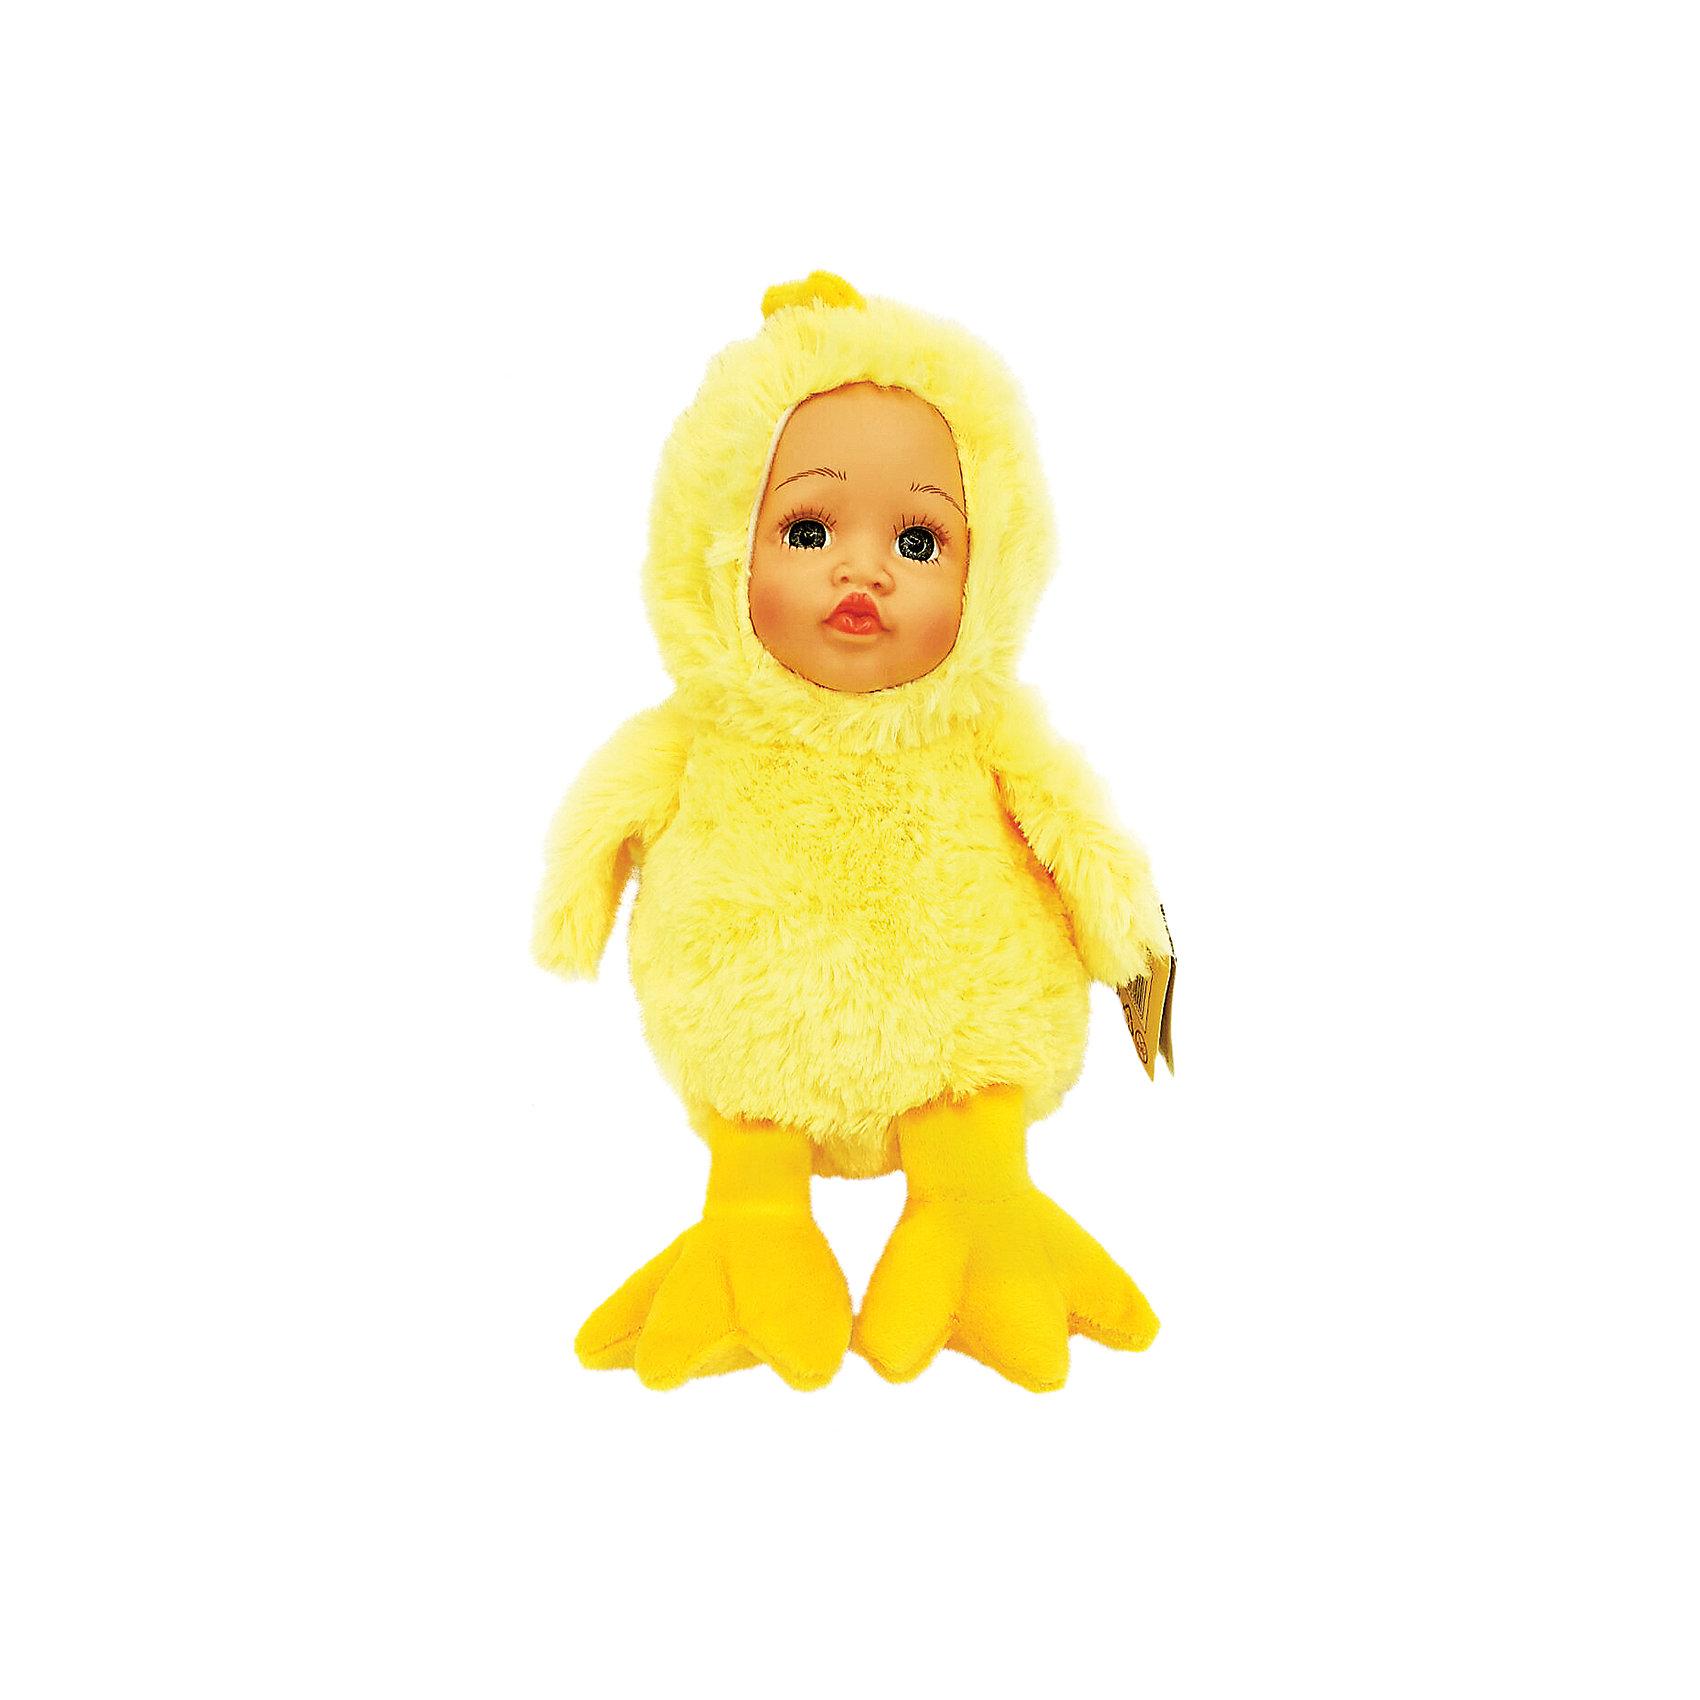 Fluffy Family Игрушка Мой цыпленок, Fluffy Family игрушка мгка fluffy family диджей 681031